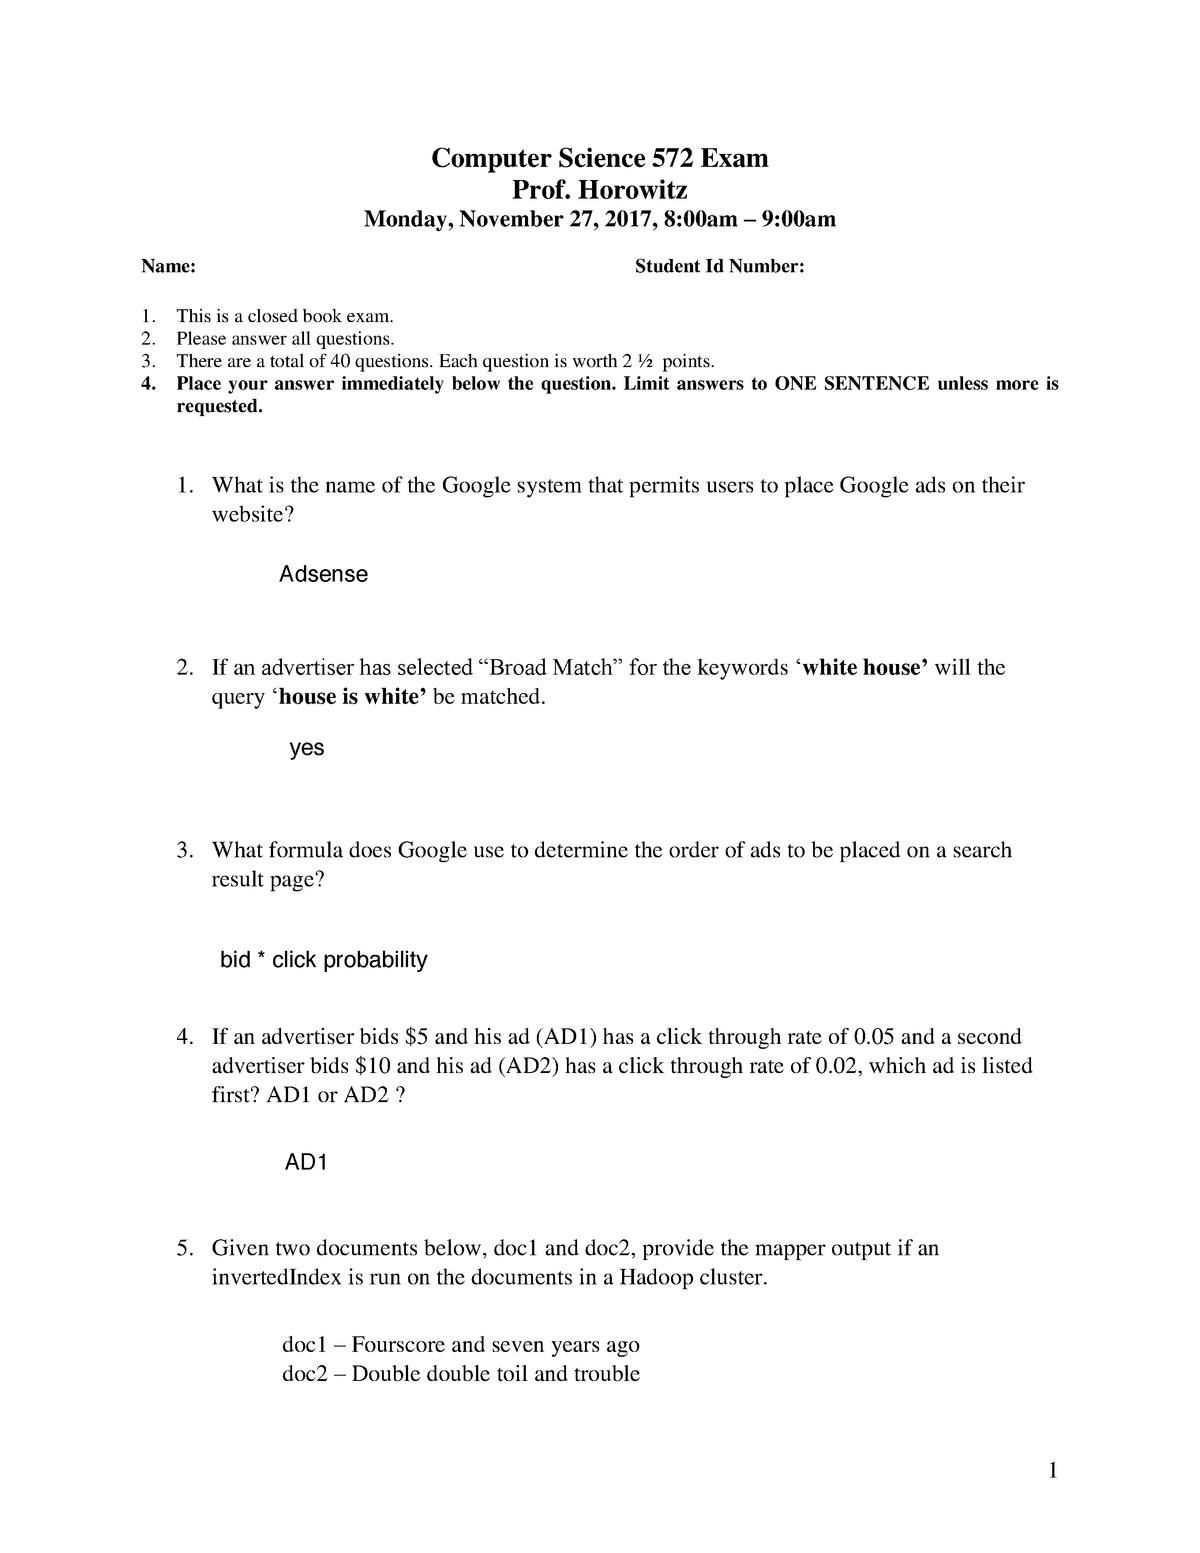 Exam 2017, questions - CSCI572 - USC - StuDocu